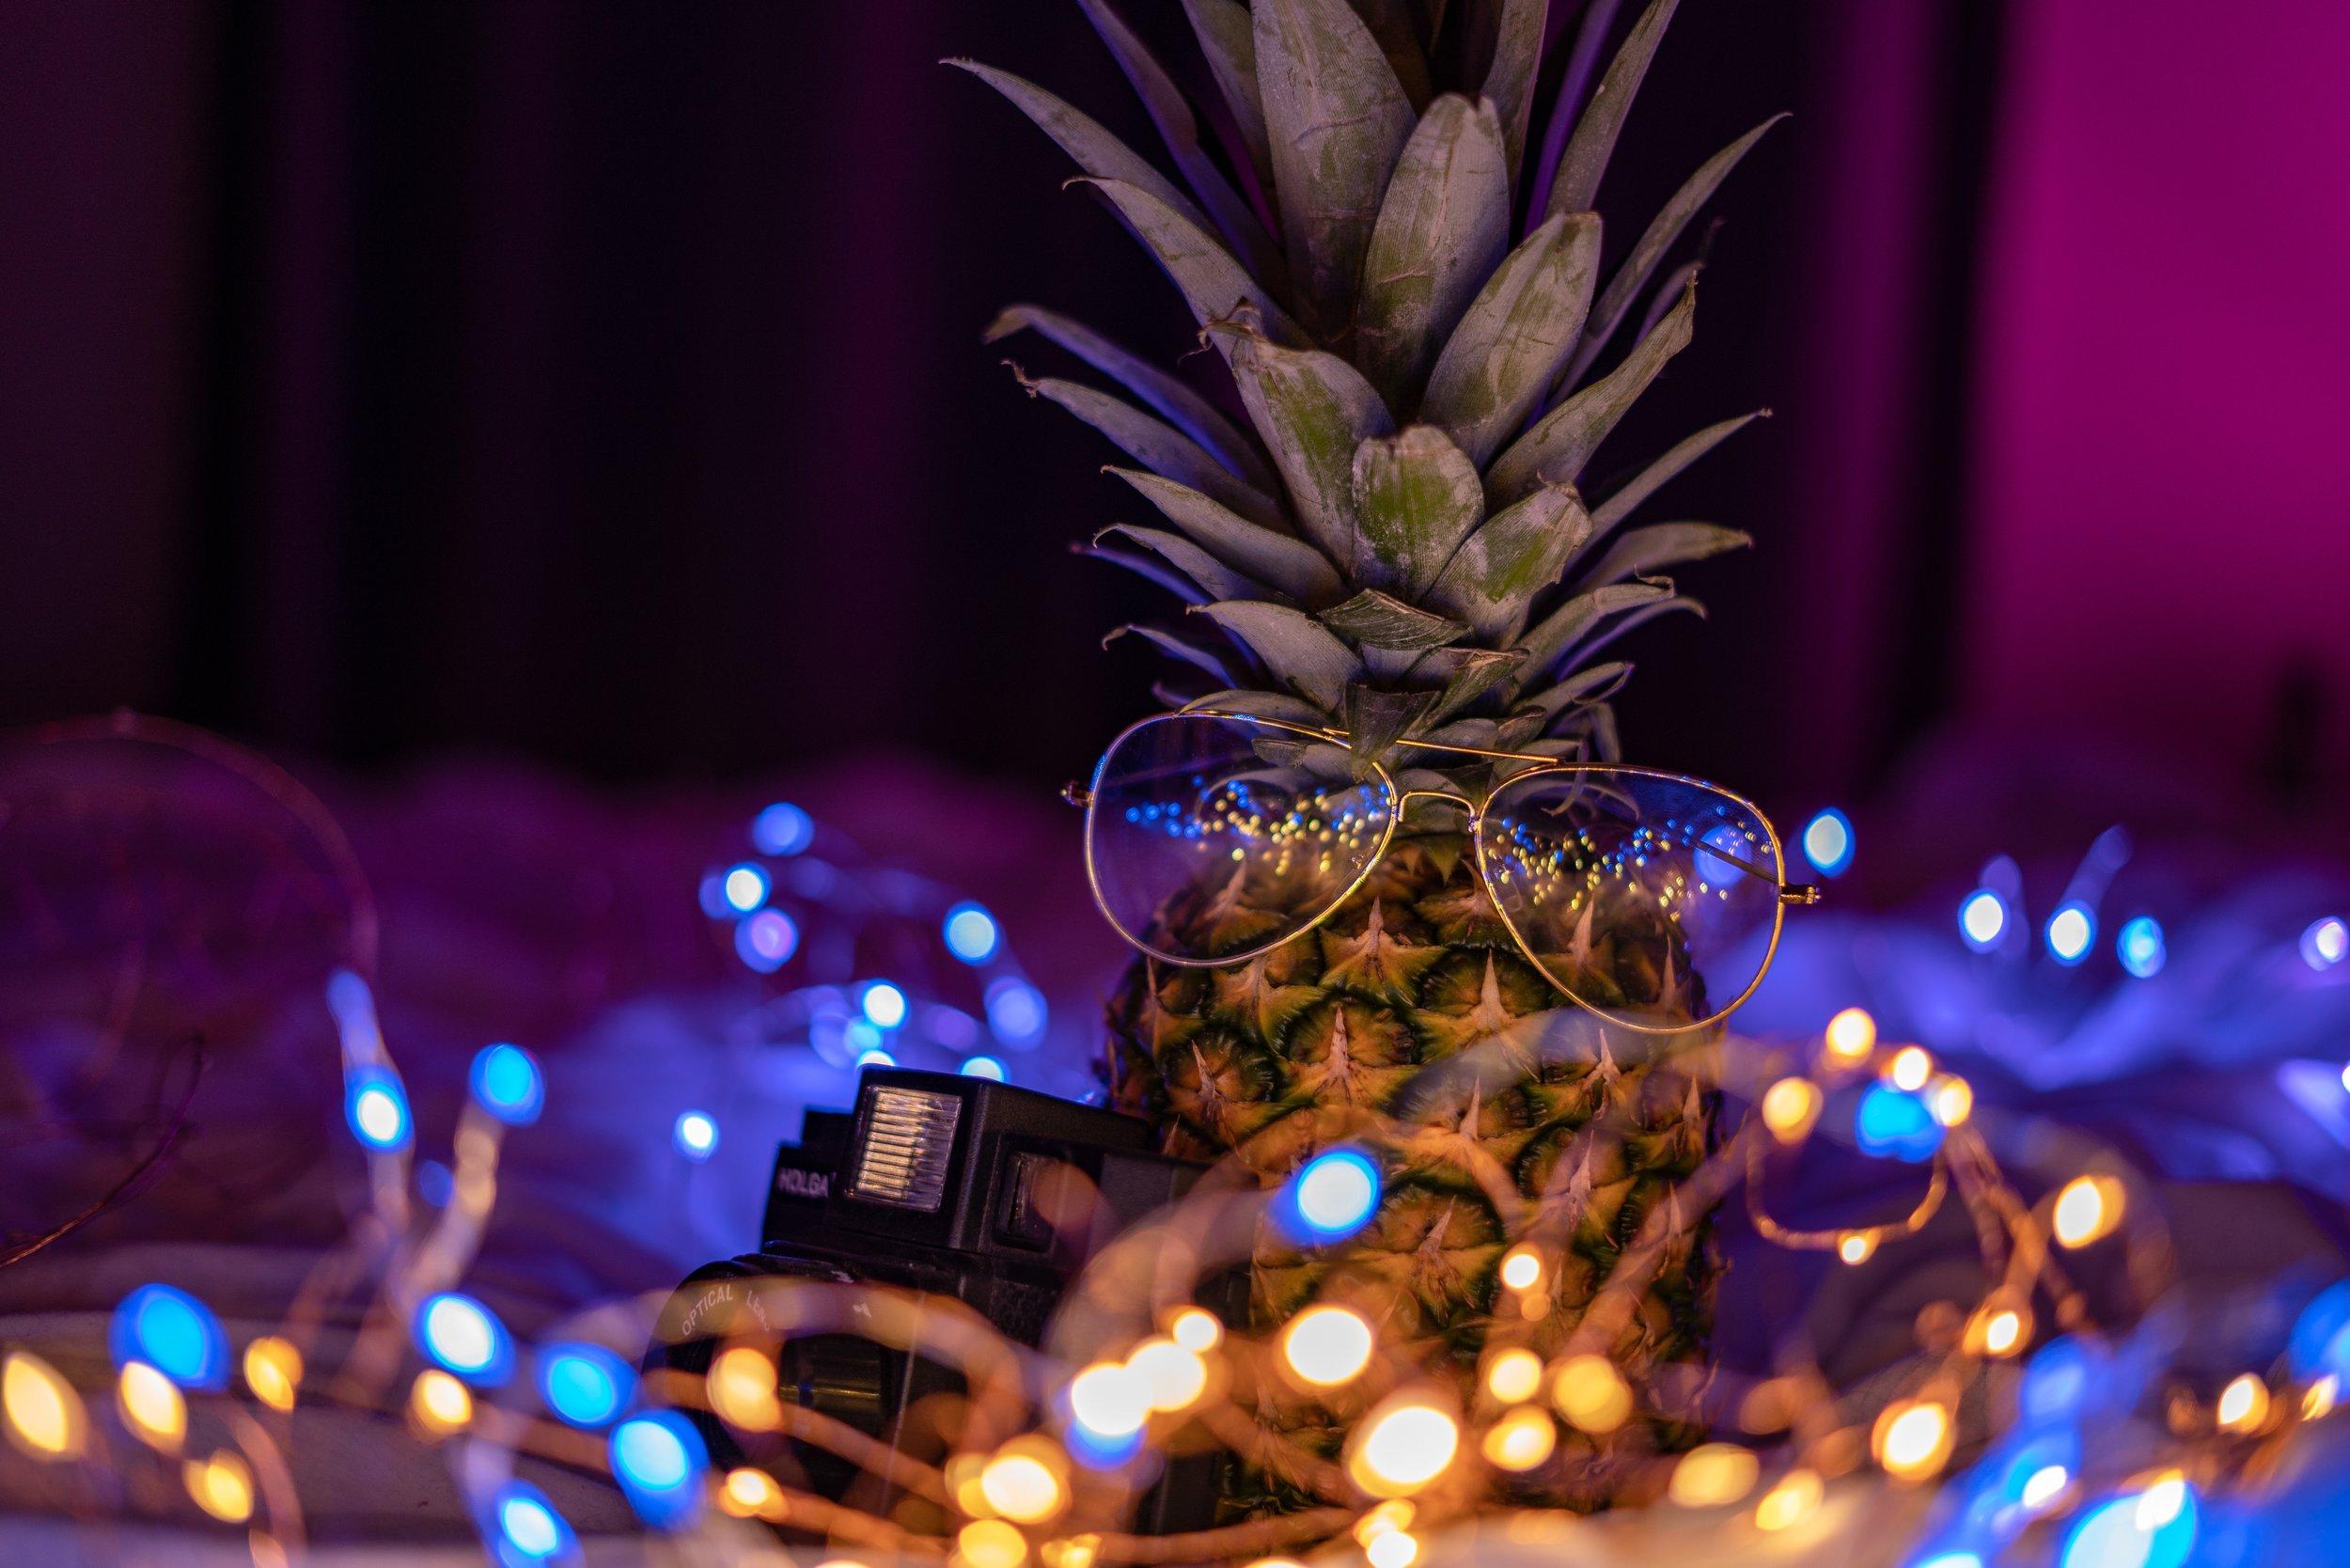 pineapple-supply-co-649574-unsplash.jpg